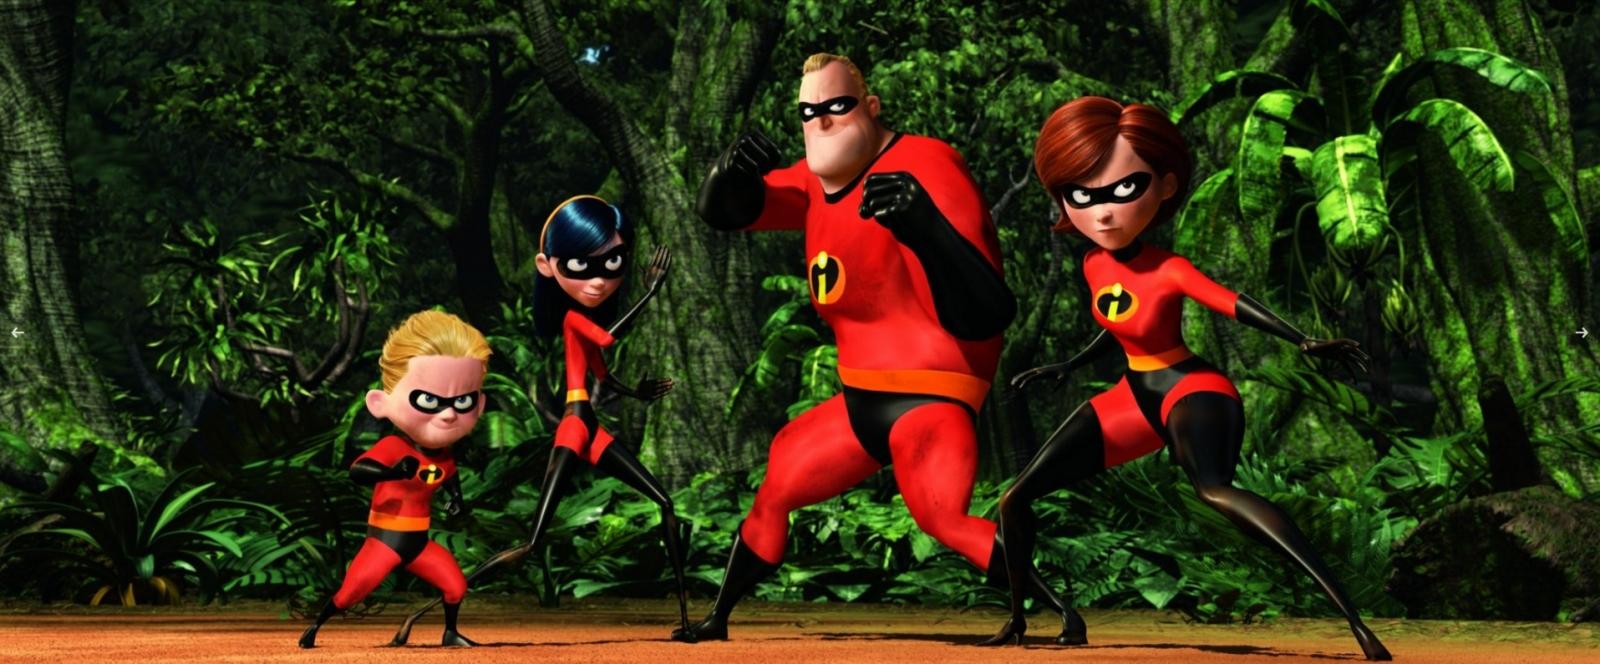 Incredibles release date in Brisbane